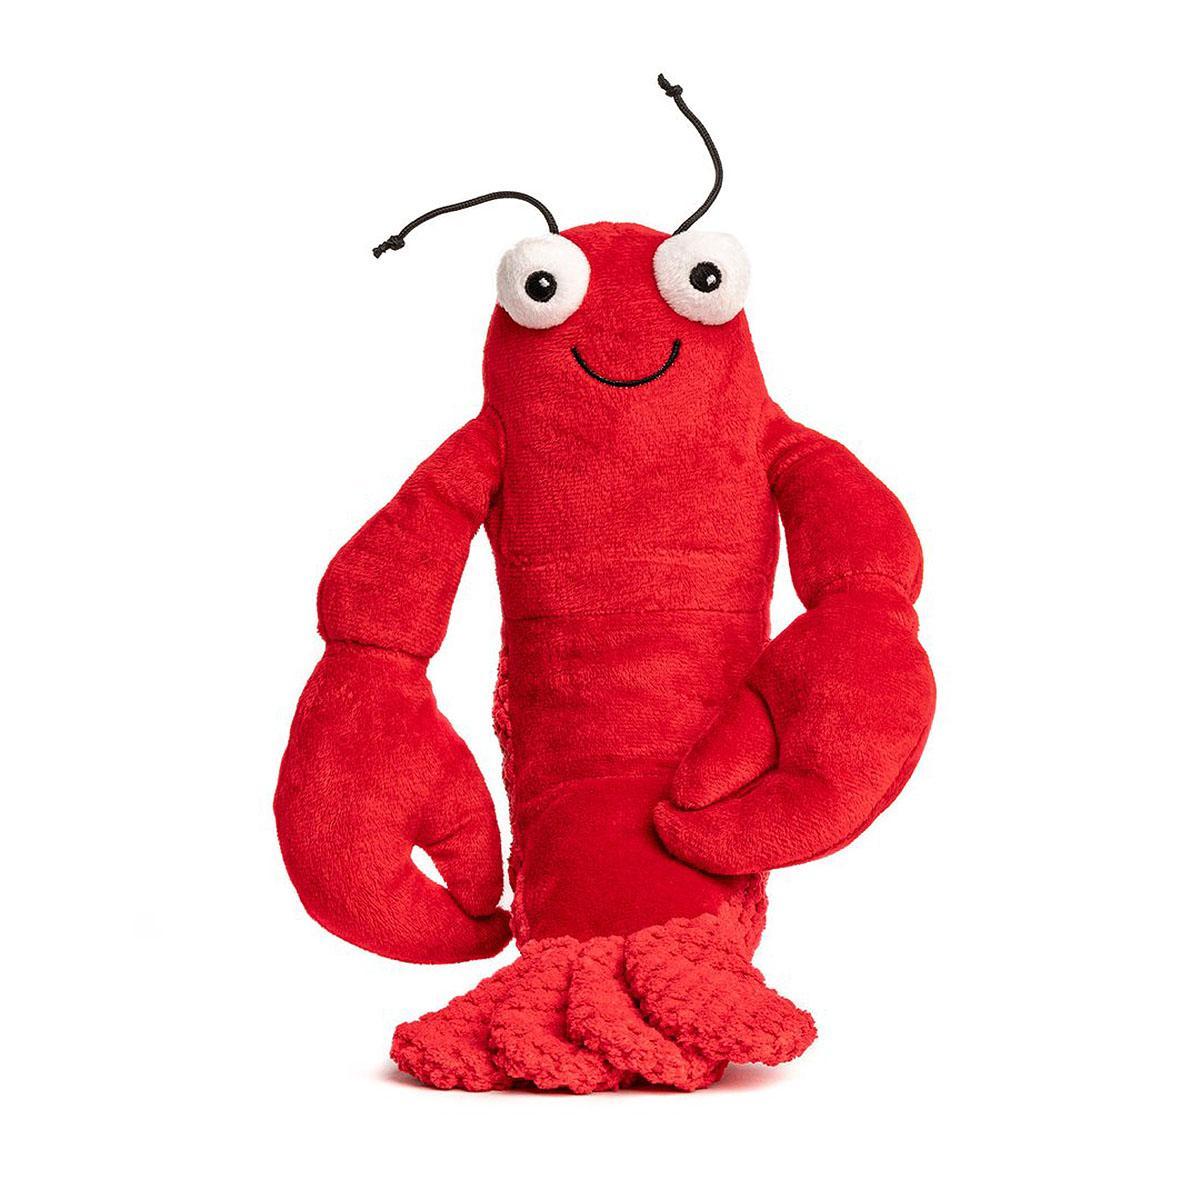 fabdog® Floppy Friends Dog Toy - Lobster